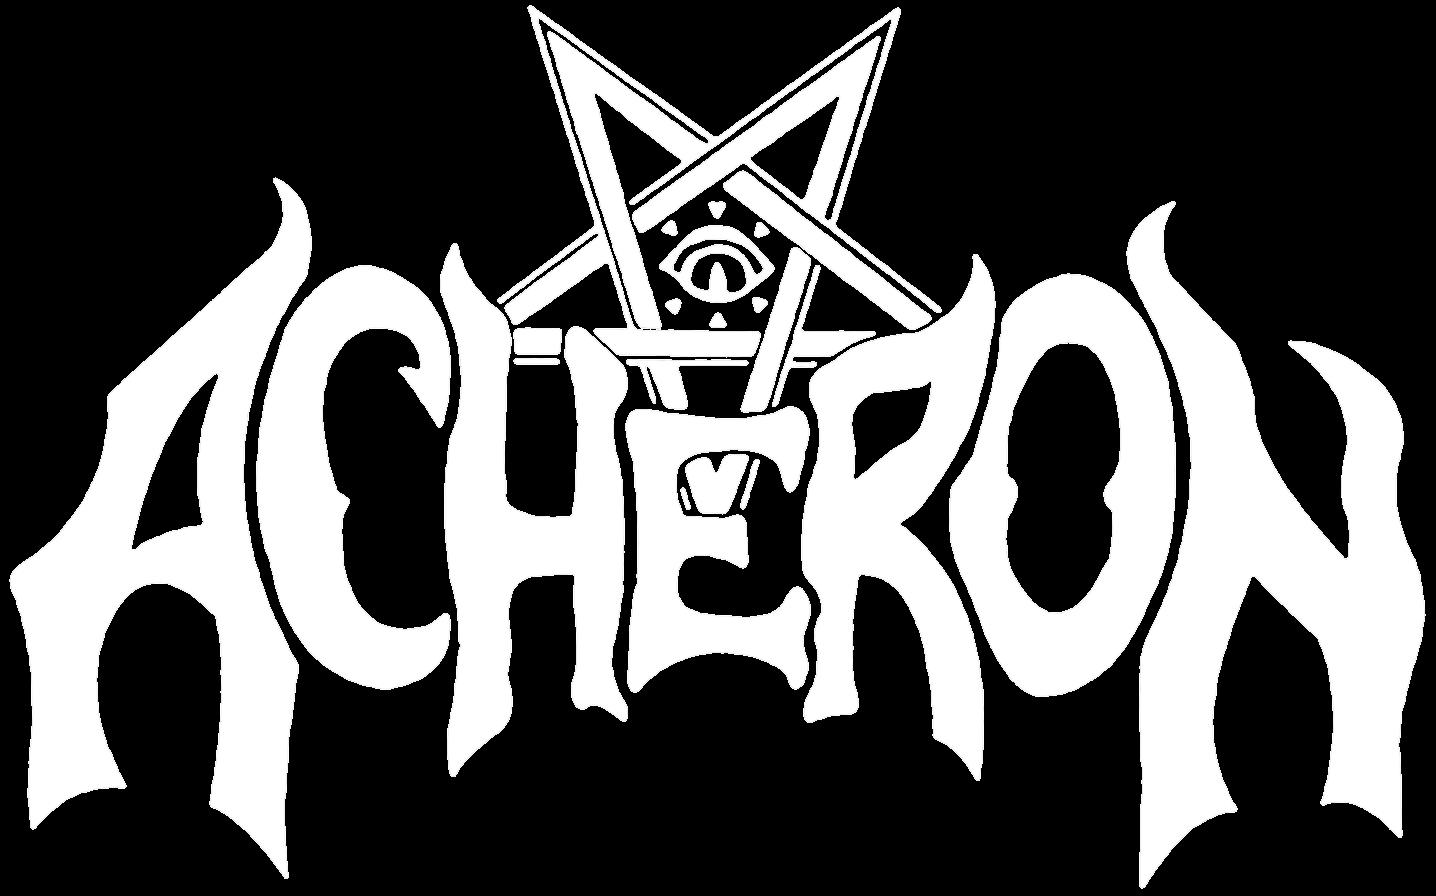 Acheron - Logo